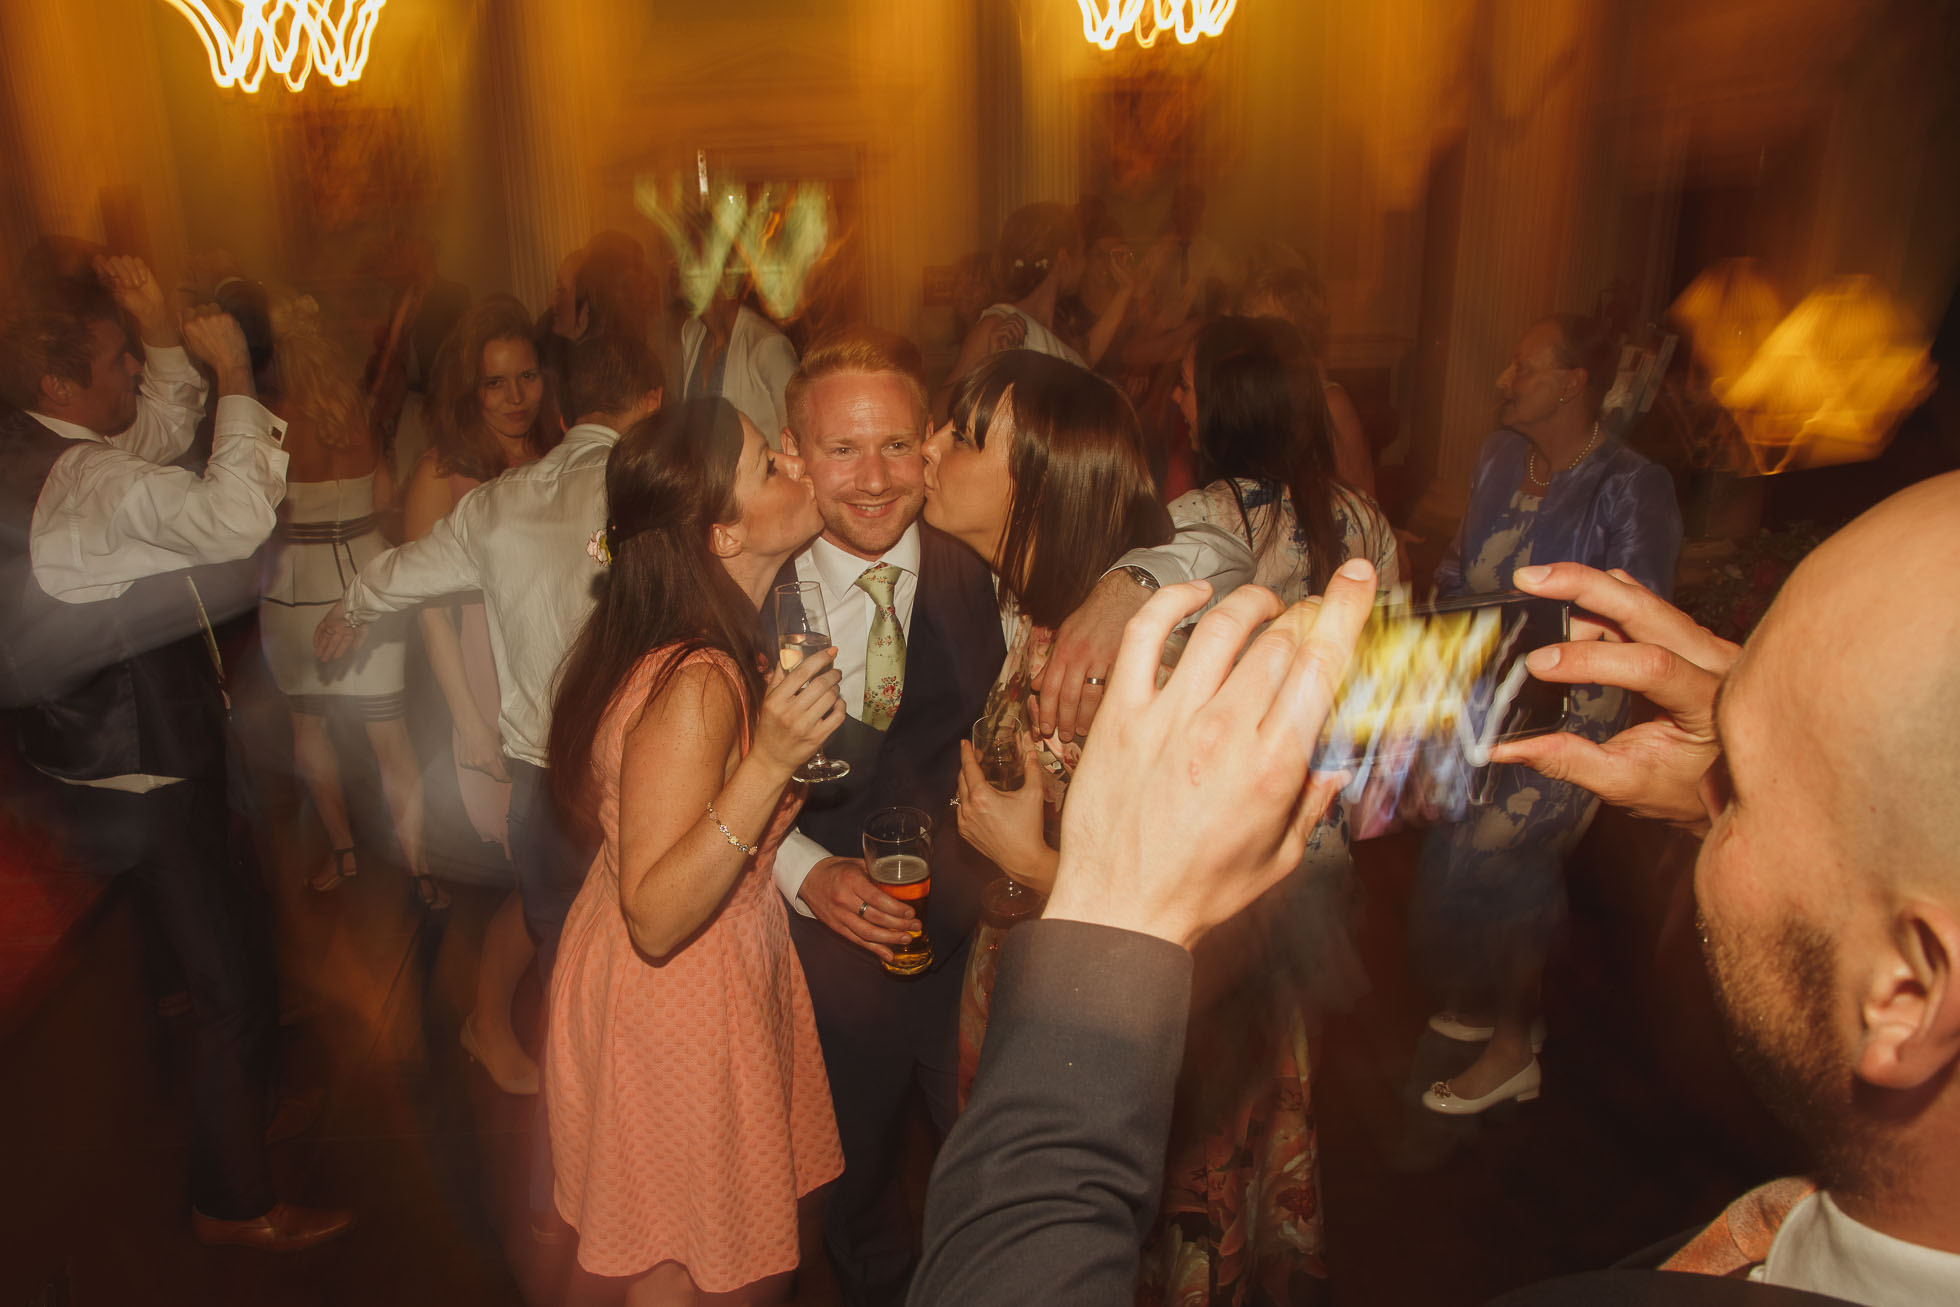 denton-hall-wedding-photographer-70.jpg